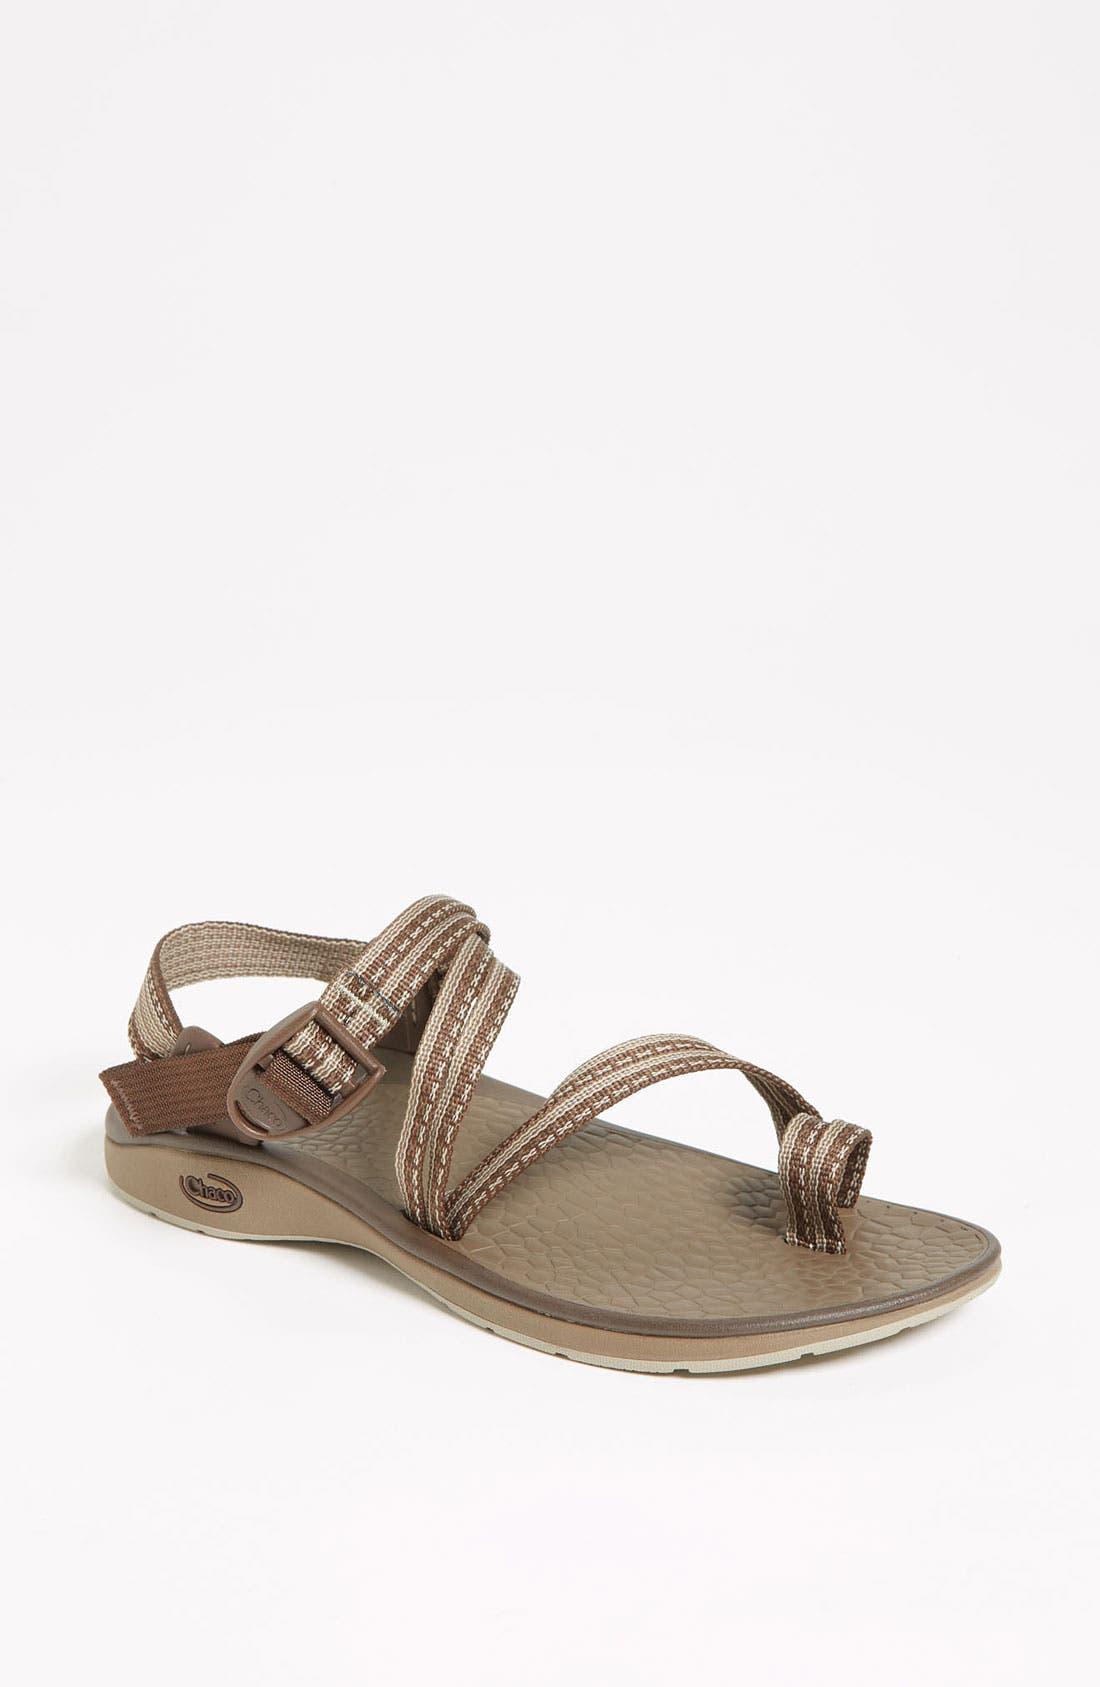 Alternate Image 1 Selected - Chaco 'Fantasia' Sandal